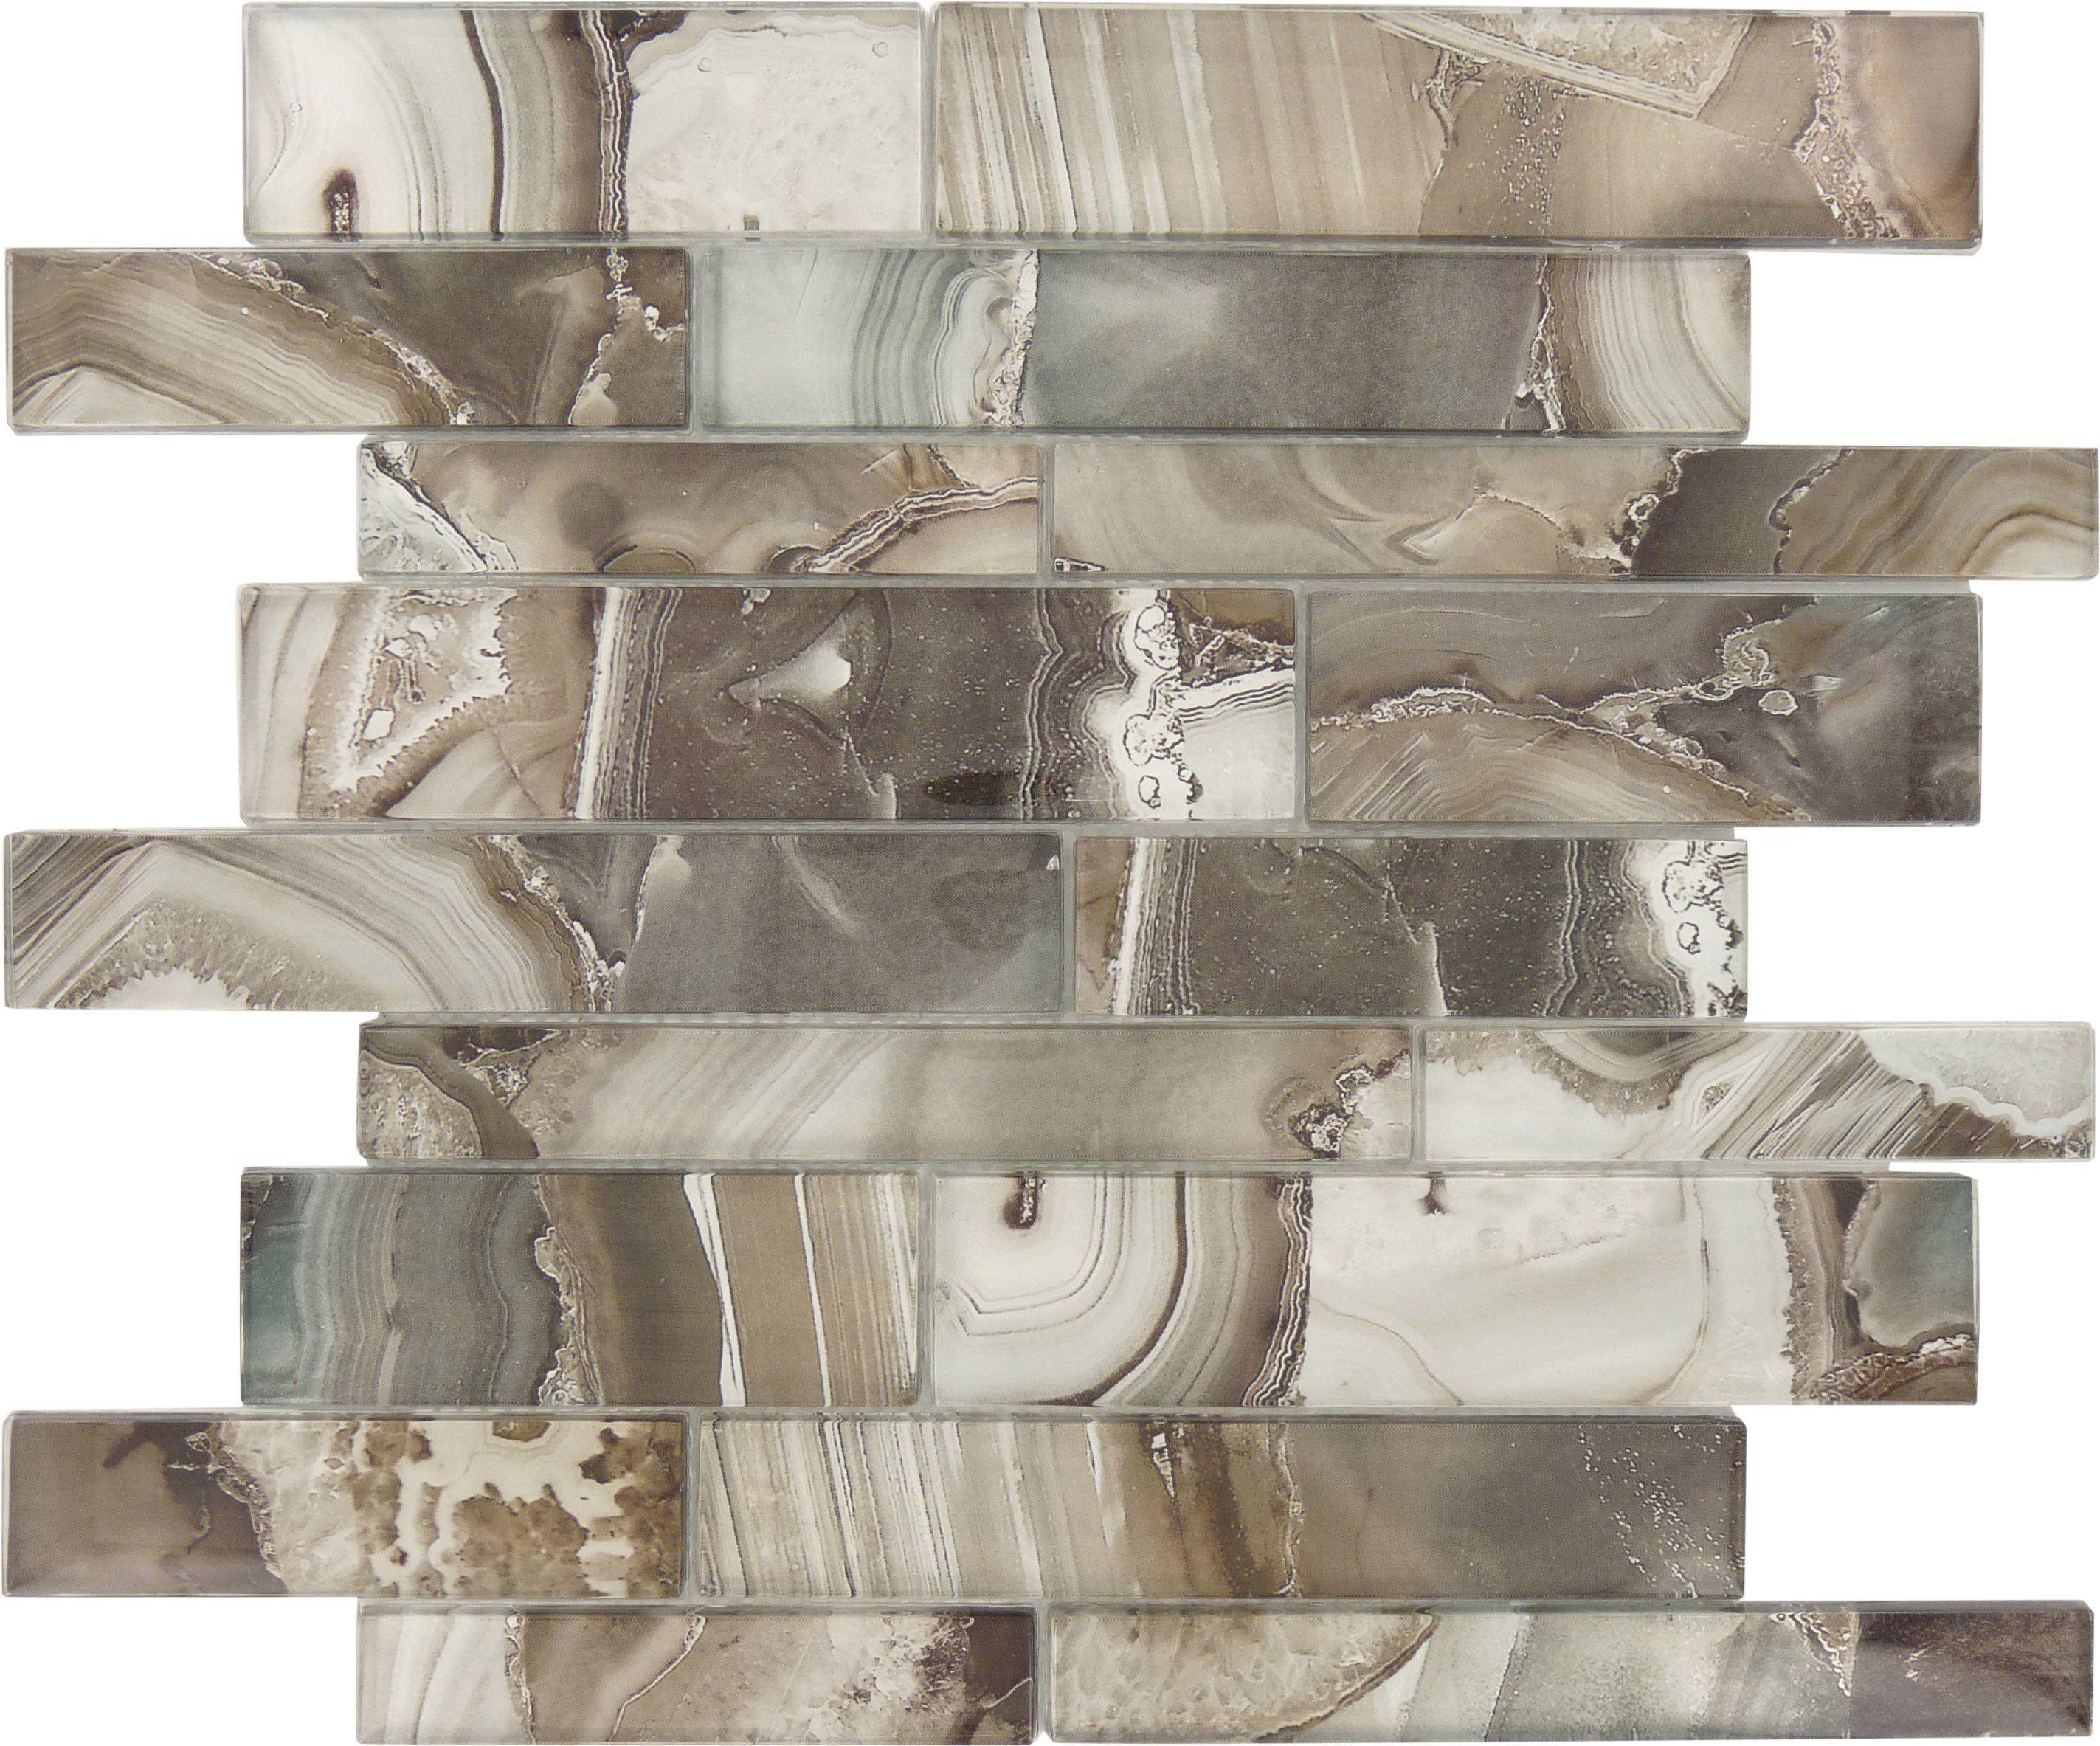 Sheet Size 11 3 4 X 11 3 4 Tile Size Random Tile Thickness 1 4 Nominal Grout Joints 1 8 Sheet Mount Mesh Backed Glass Tile Tiles Brick